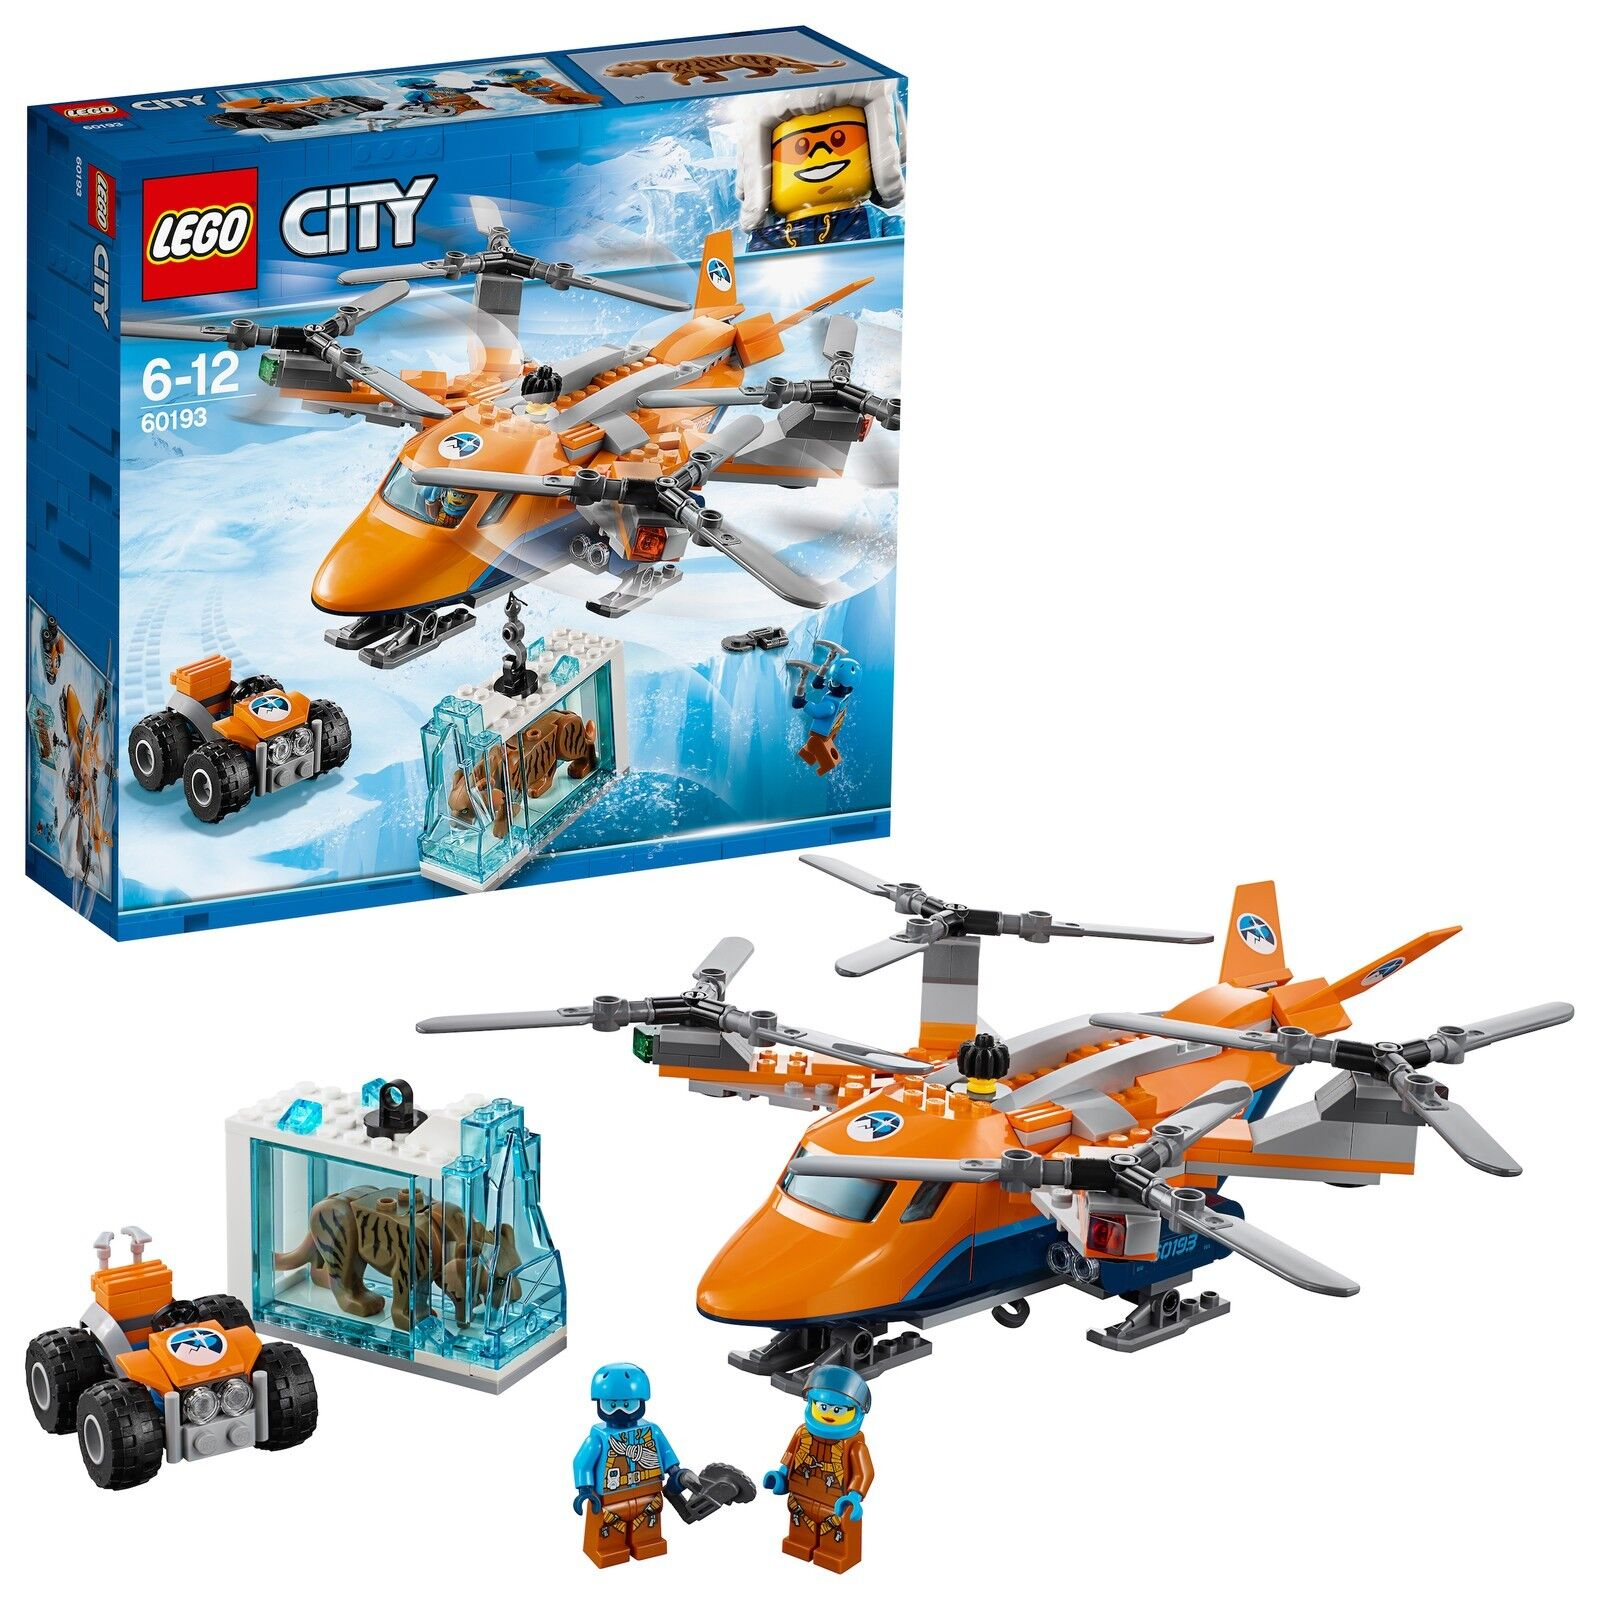 LEGO® City 60193 Arktis-Frachtflugzeug NEU OVP_ Arctic Air Air Air Transport NEW MISB 85b76e